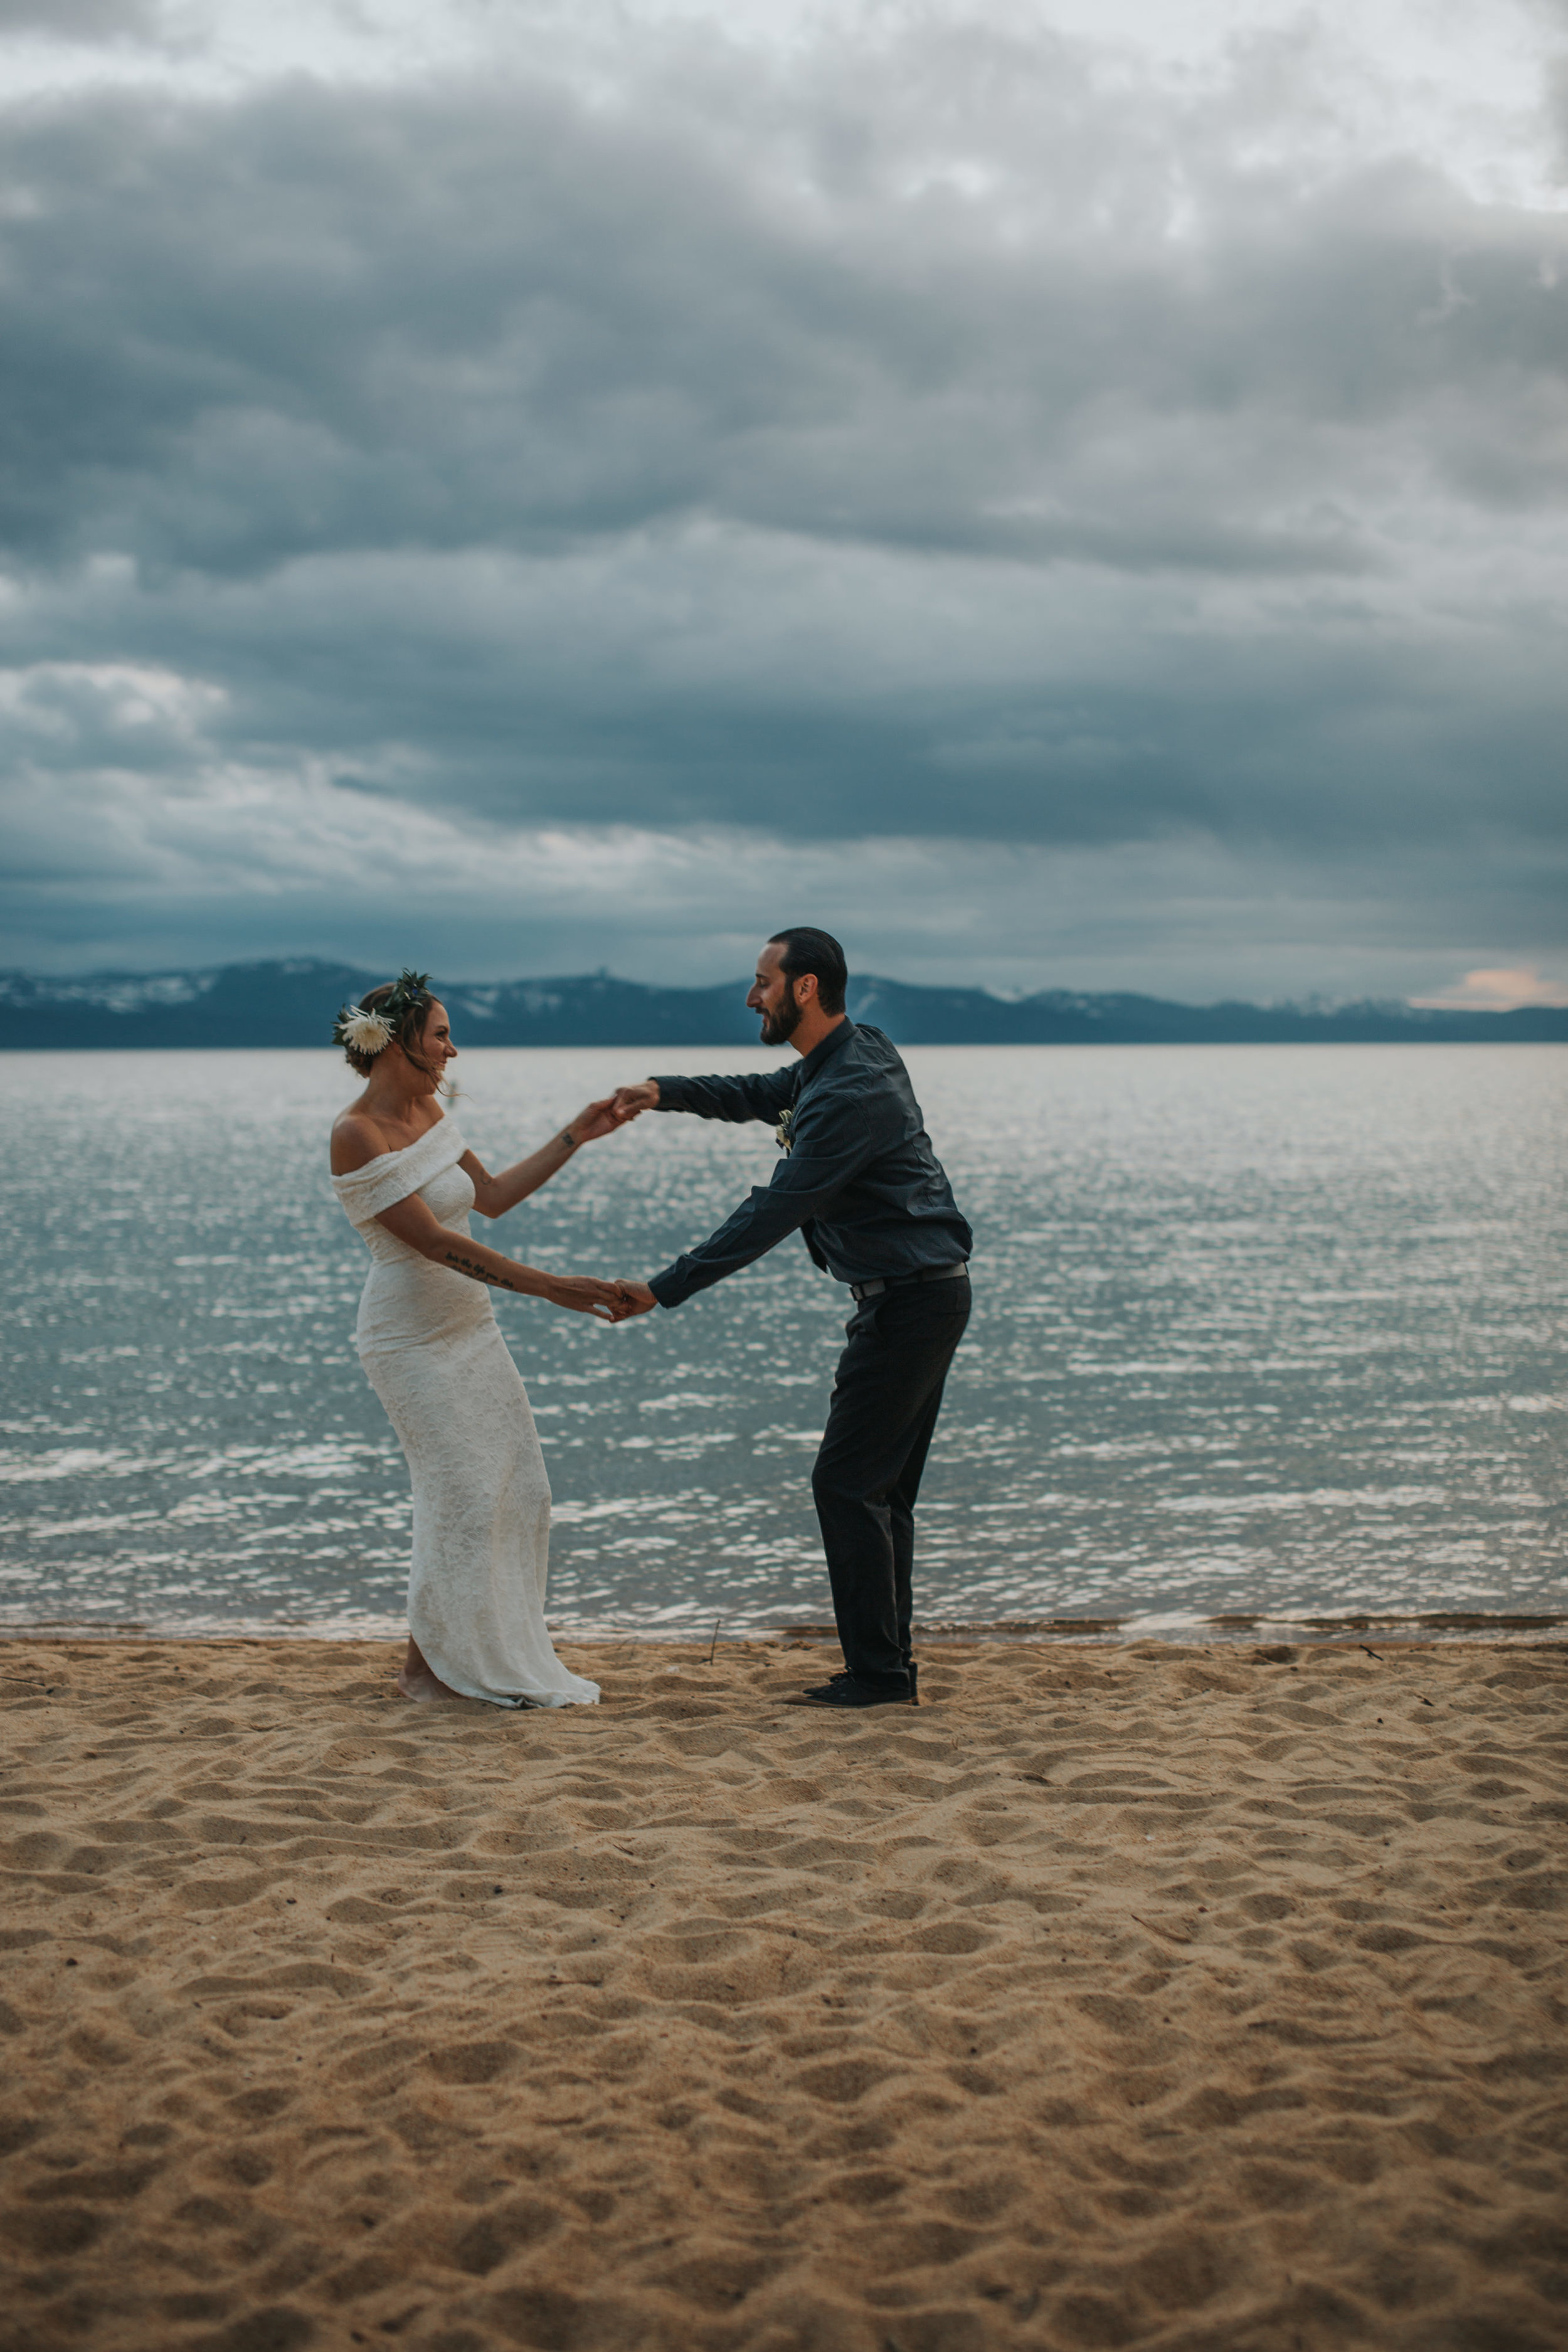 south-lake-tahoe-elopement-valerie-lendvay-photo-058.jpg